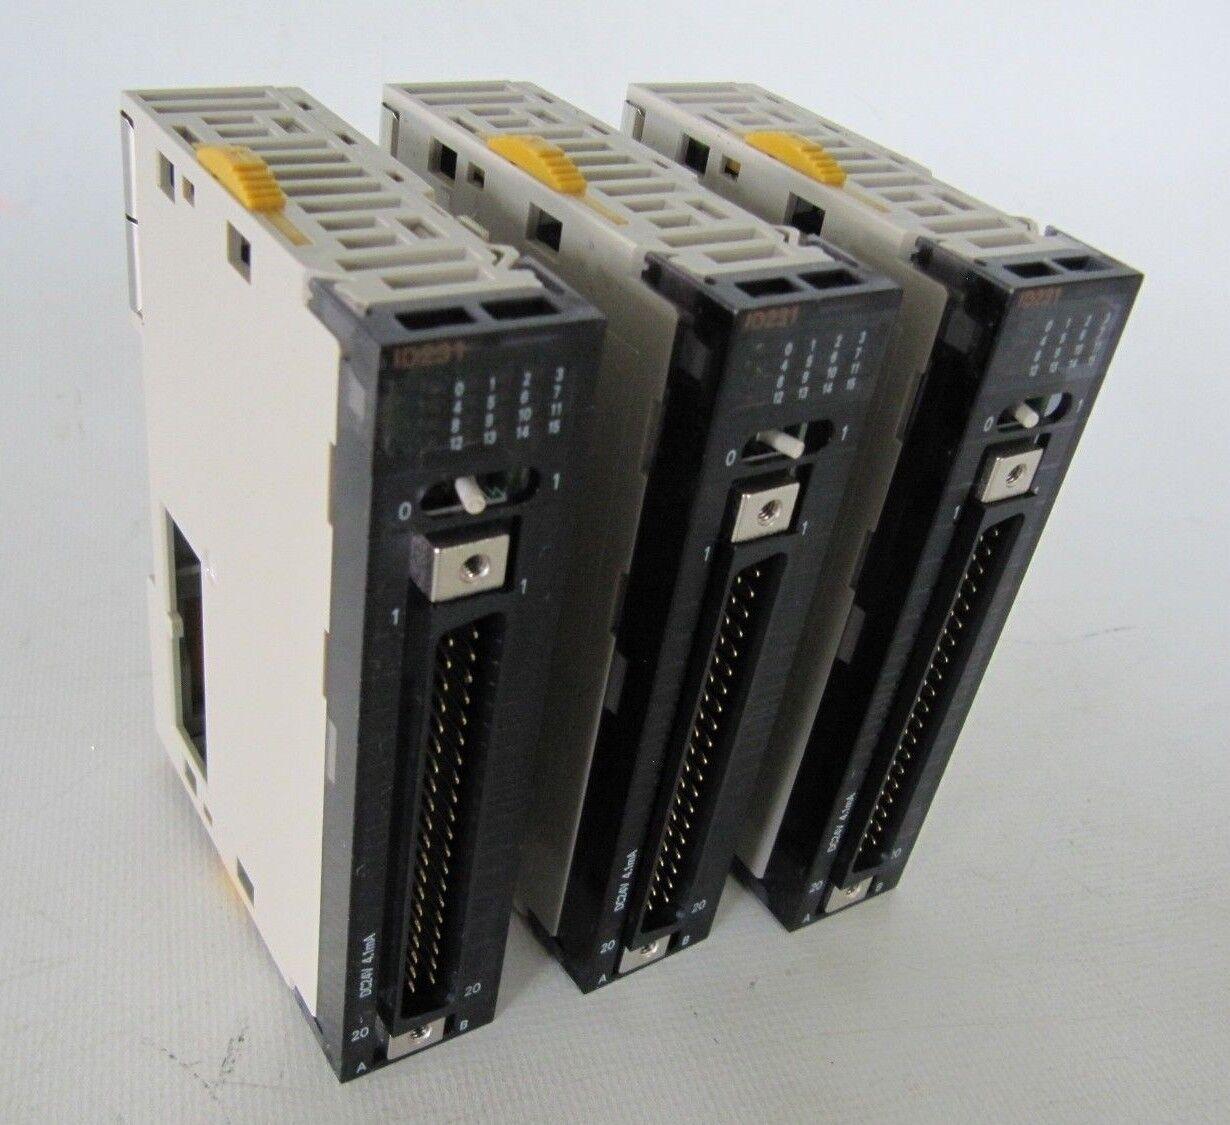 Omron 16 Ch PLC Digital Input Unit CJ1W-ID231